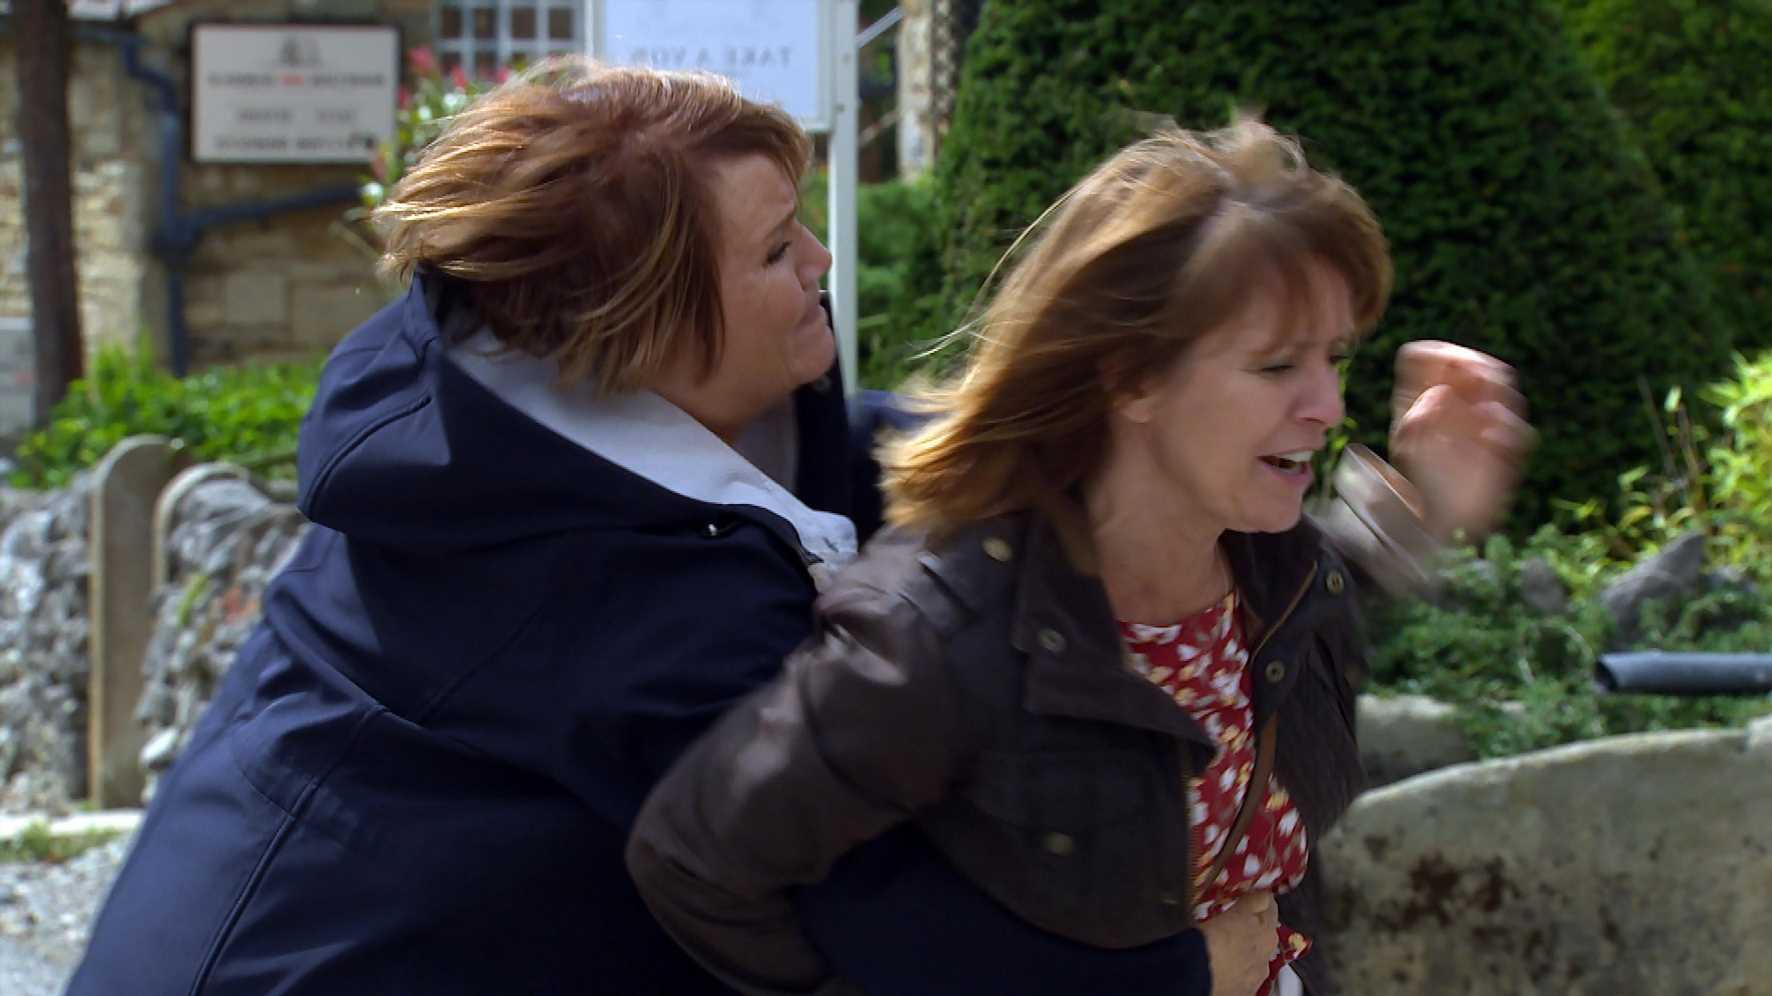 Emmerdale spoilers: Rhona Goskirk in violent fight with Brenda Walker over bully Cathy